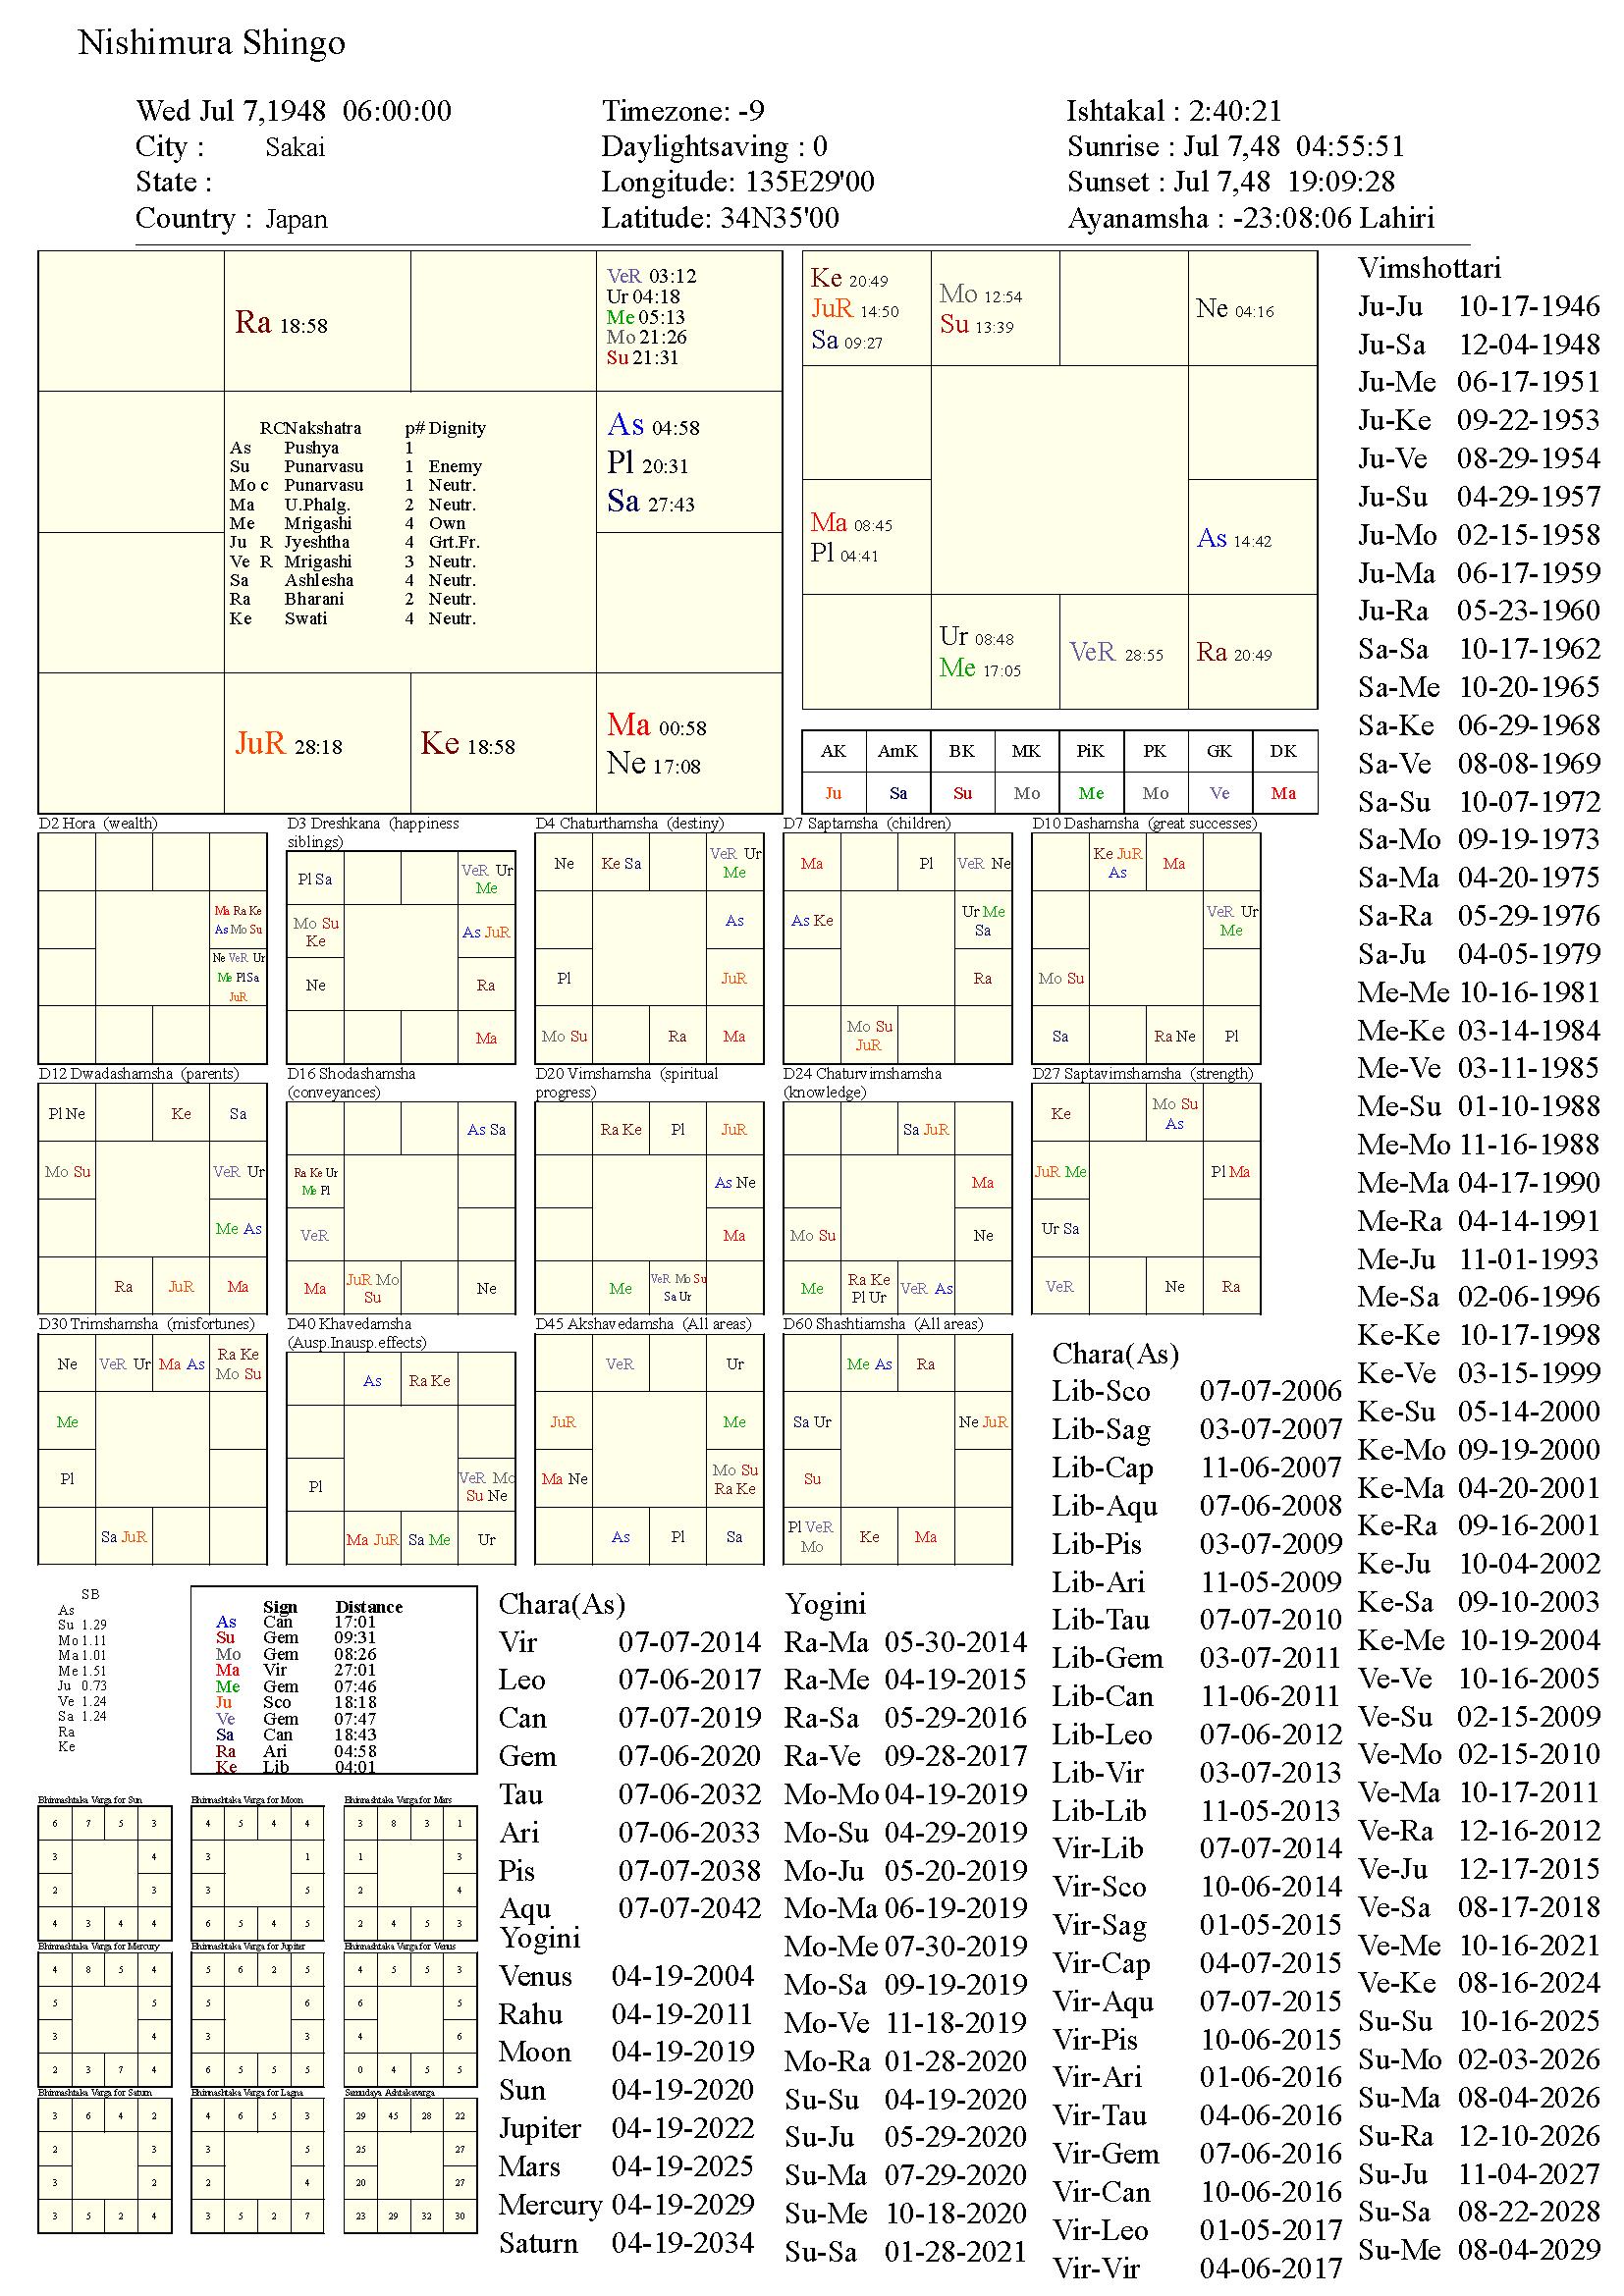 nishimurashingo_chart